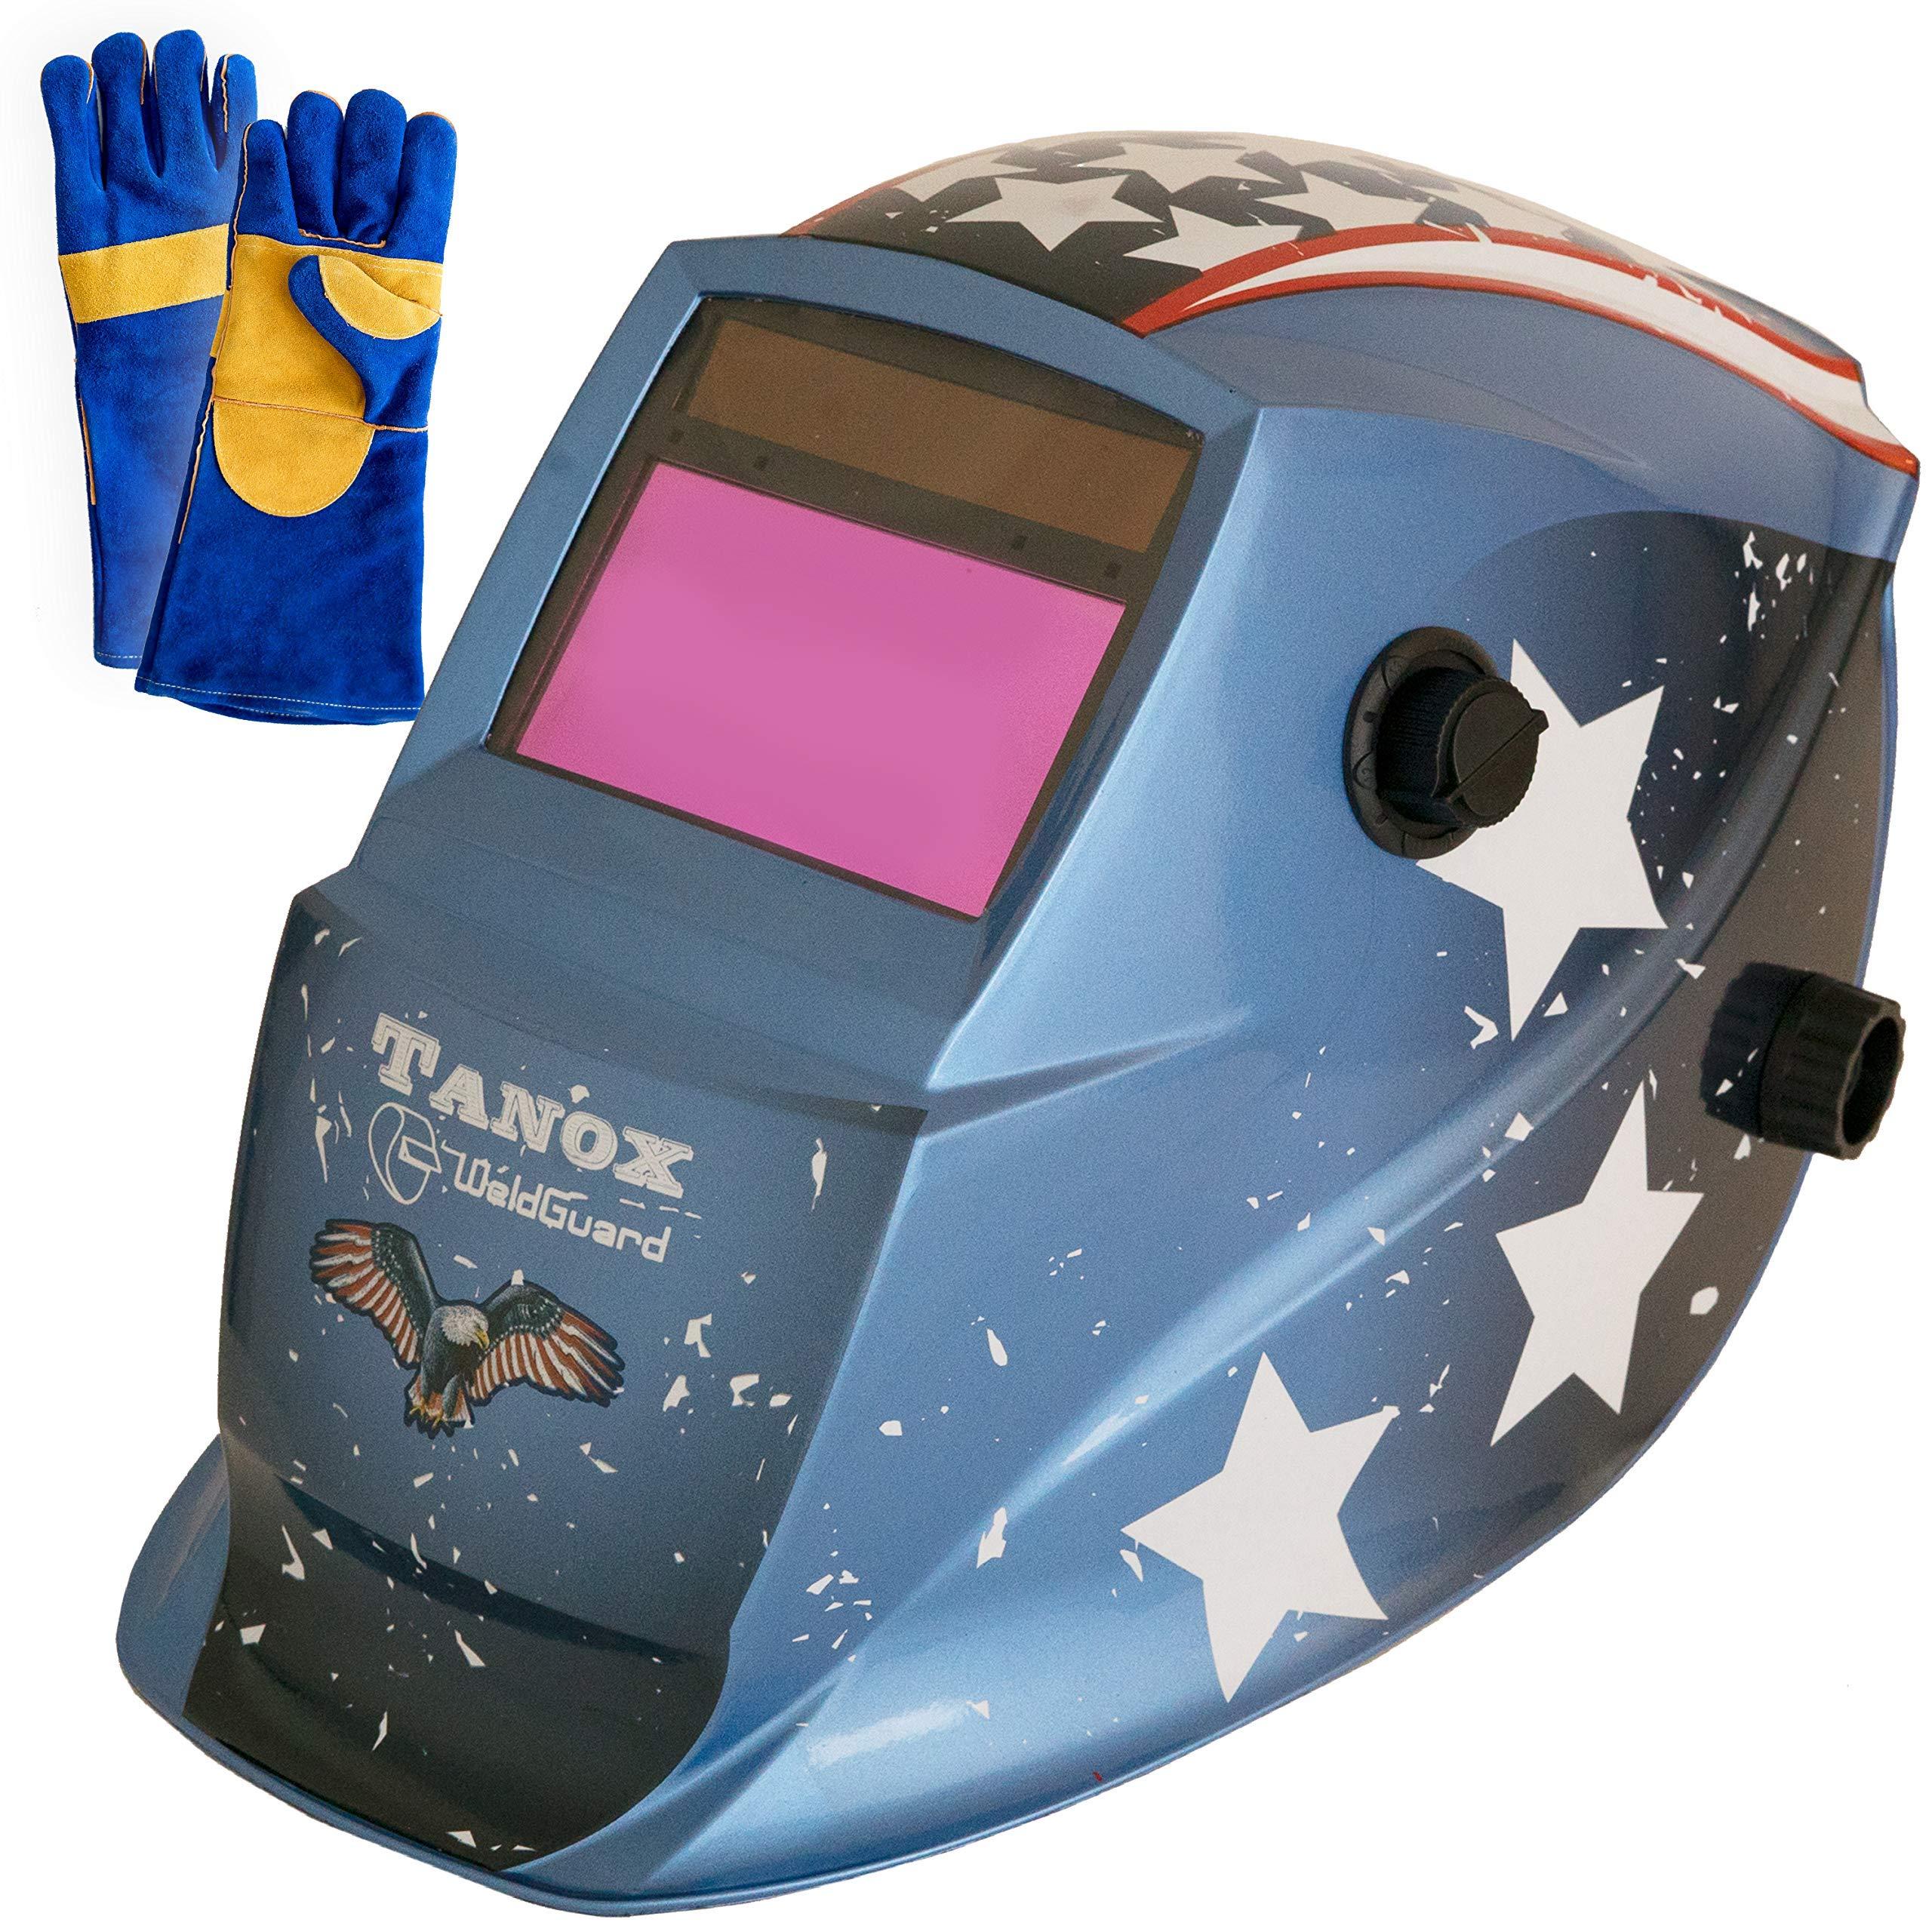 Tanox Auto Darkening Solar Powered Welding Helmet ADF-206S(USA Power): Shade Lens, Tig Mig MMA, Adjustable Range 4/9-13, Grinding 0000, Plus 16 Inch Kevlar Fire Retardant Welding Gloves